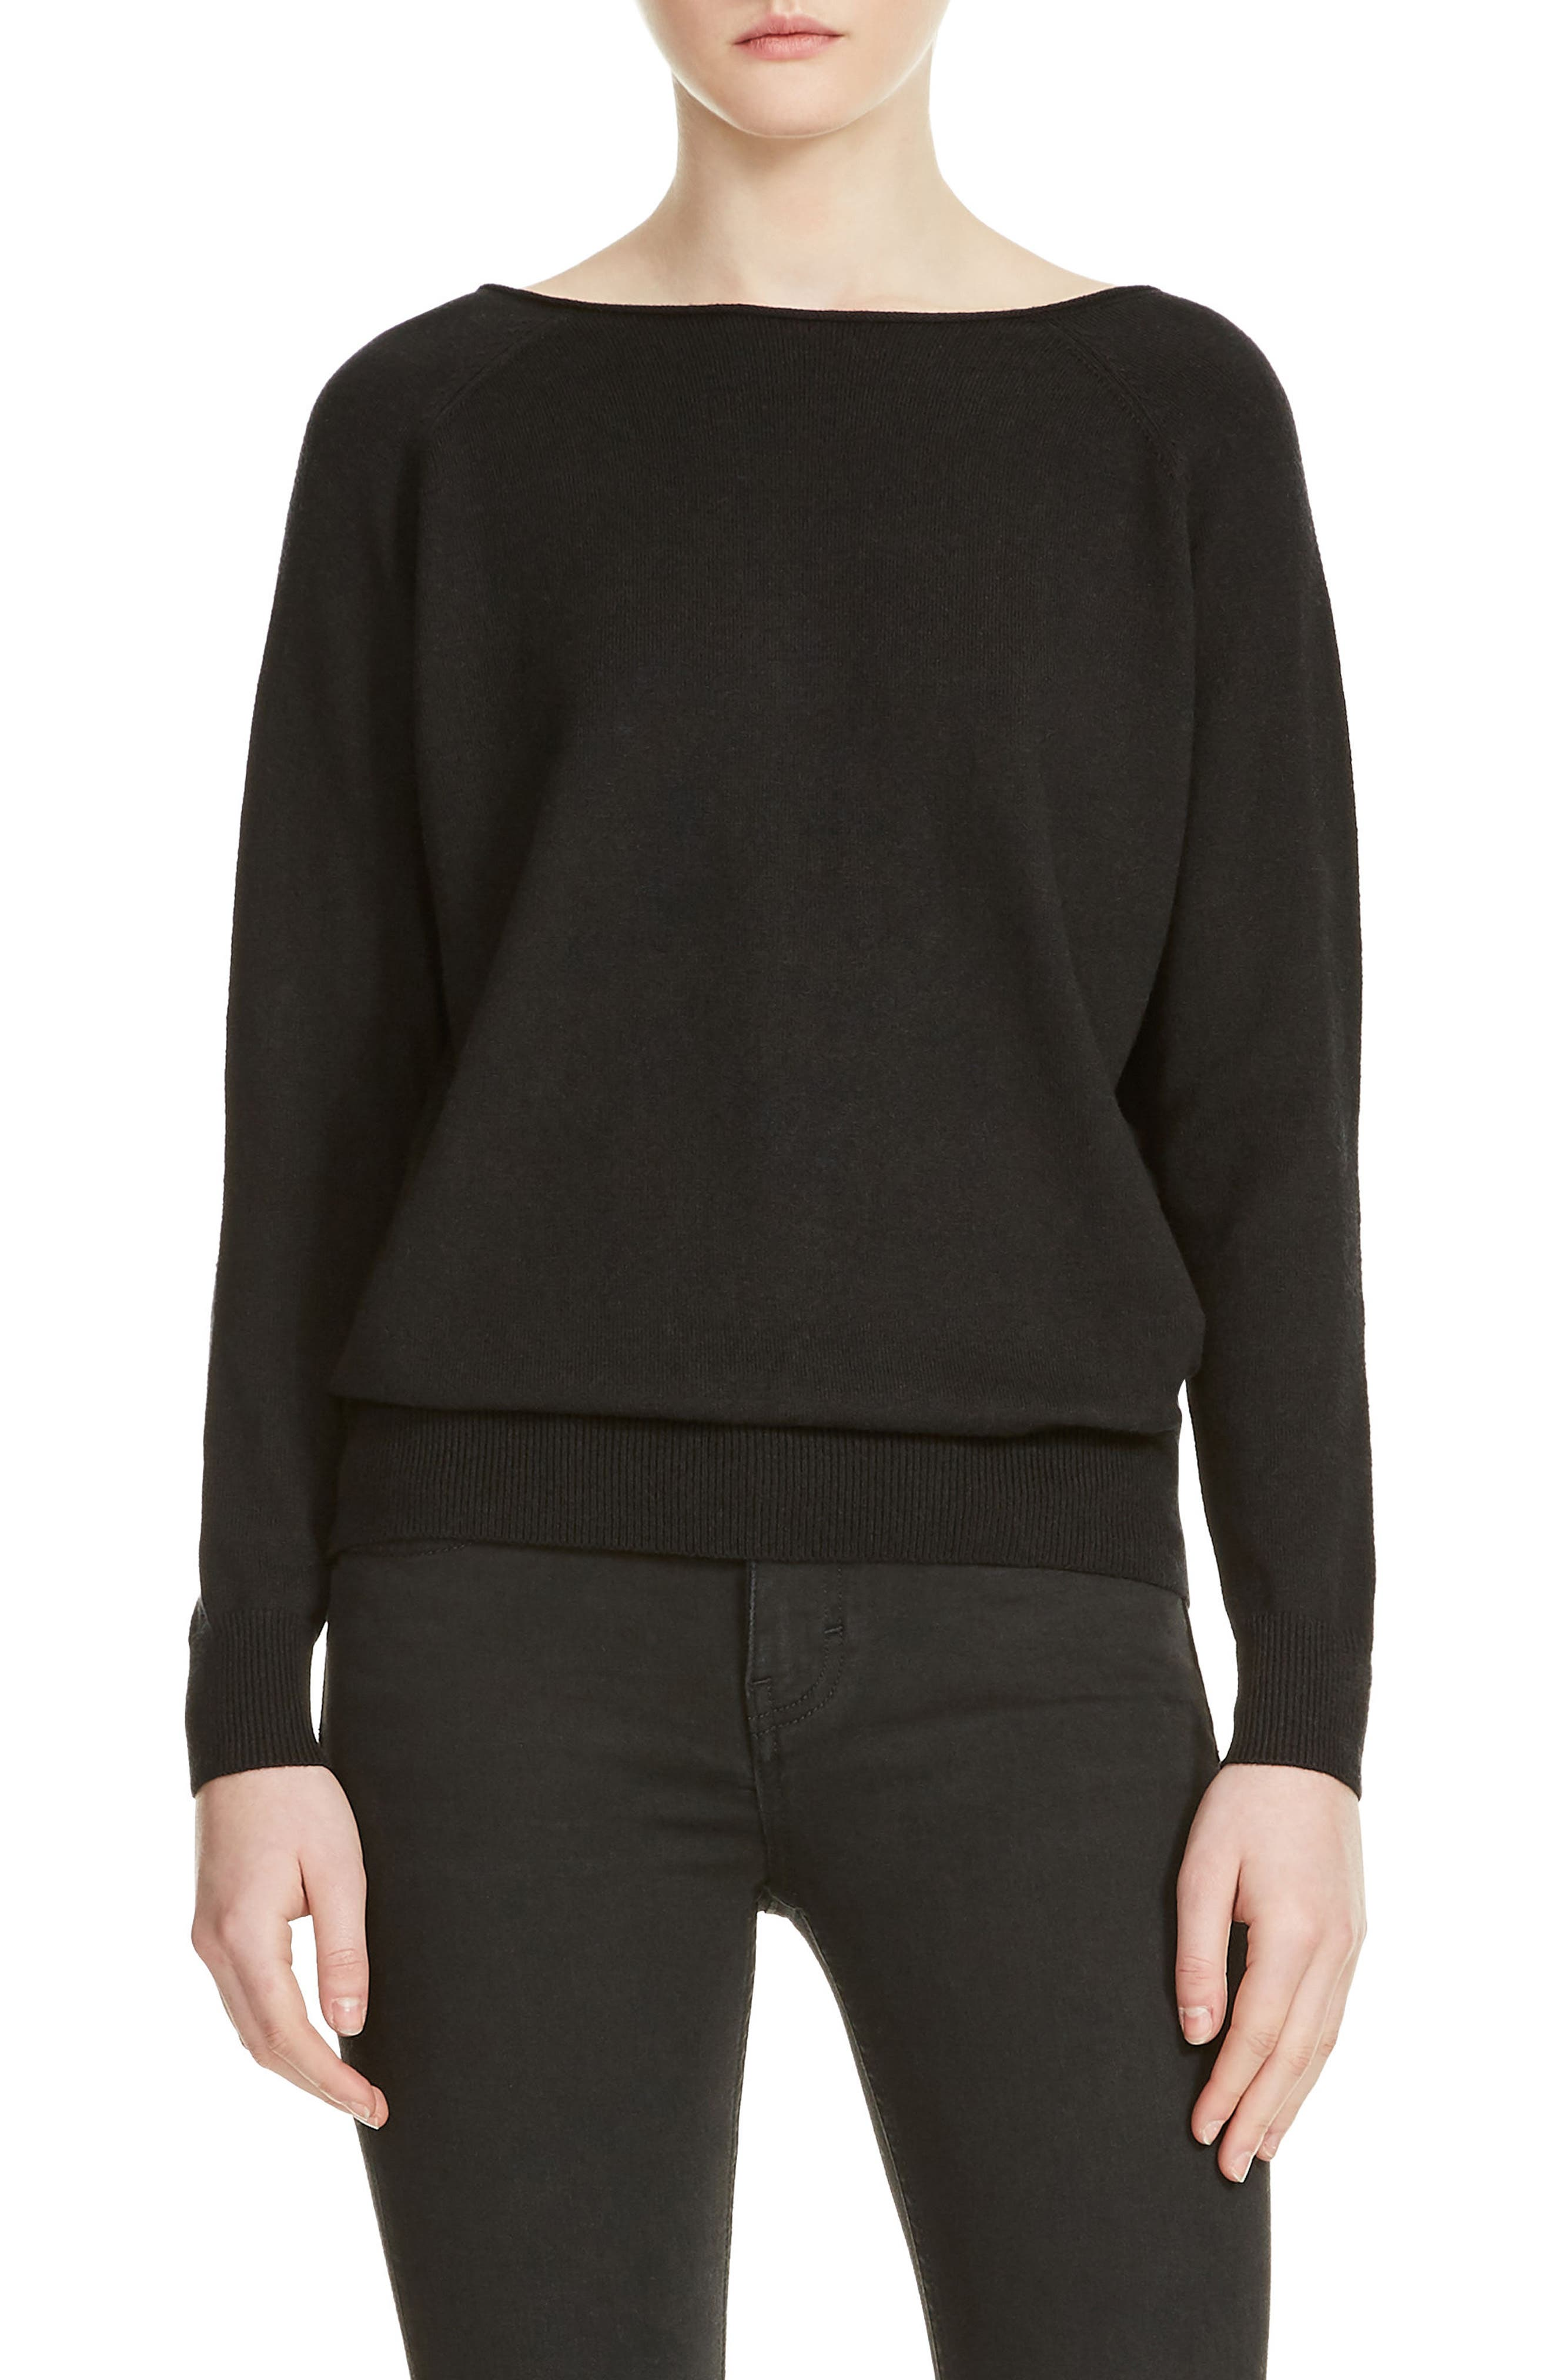 Macademia Chain Back Sweater,                             Main thumbnail 1, color,                             Black